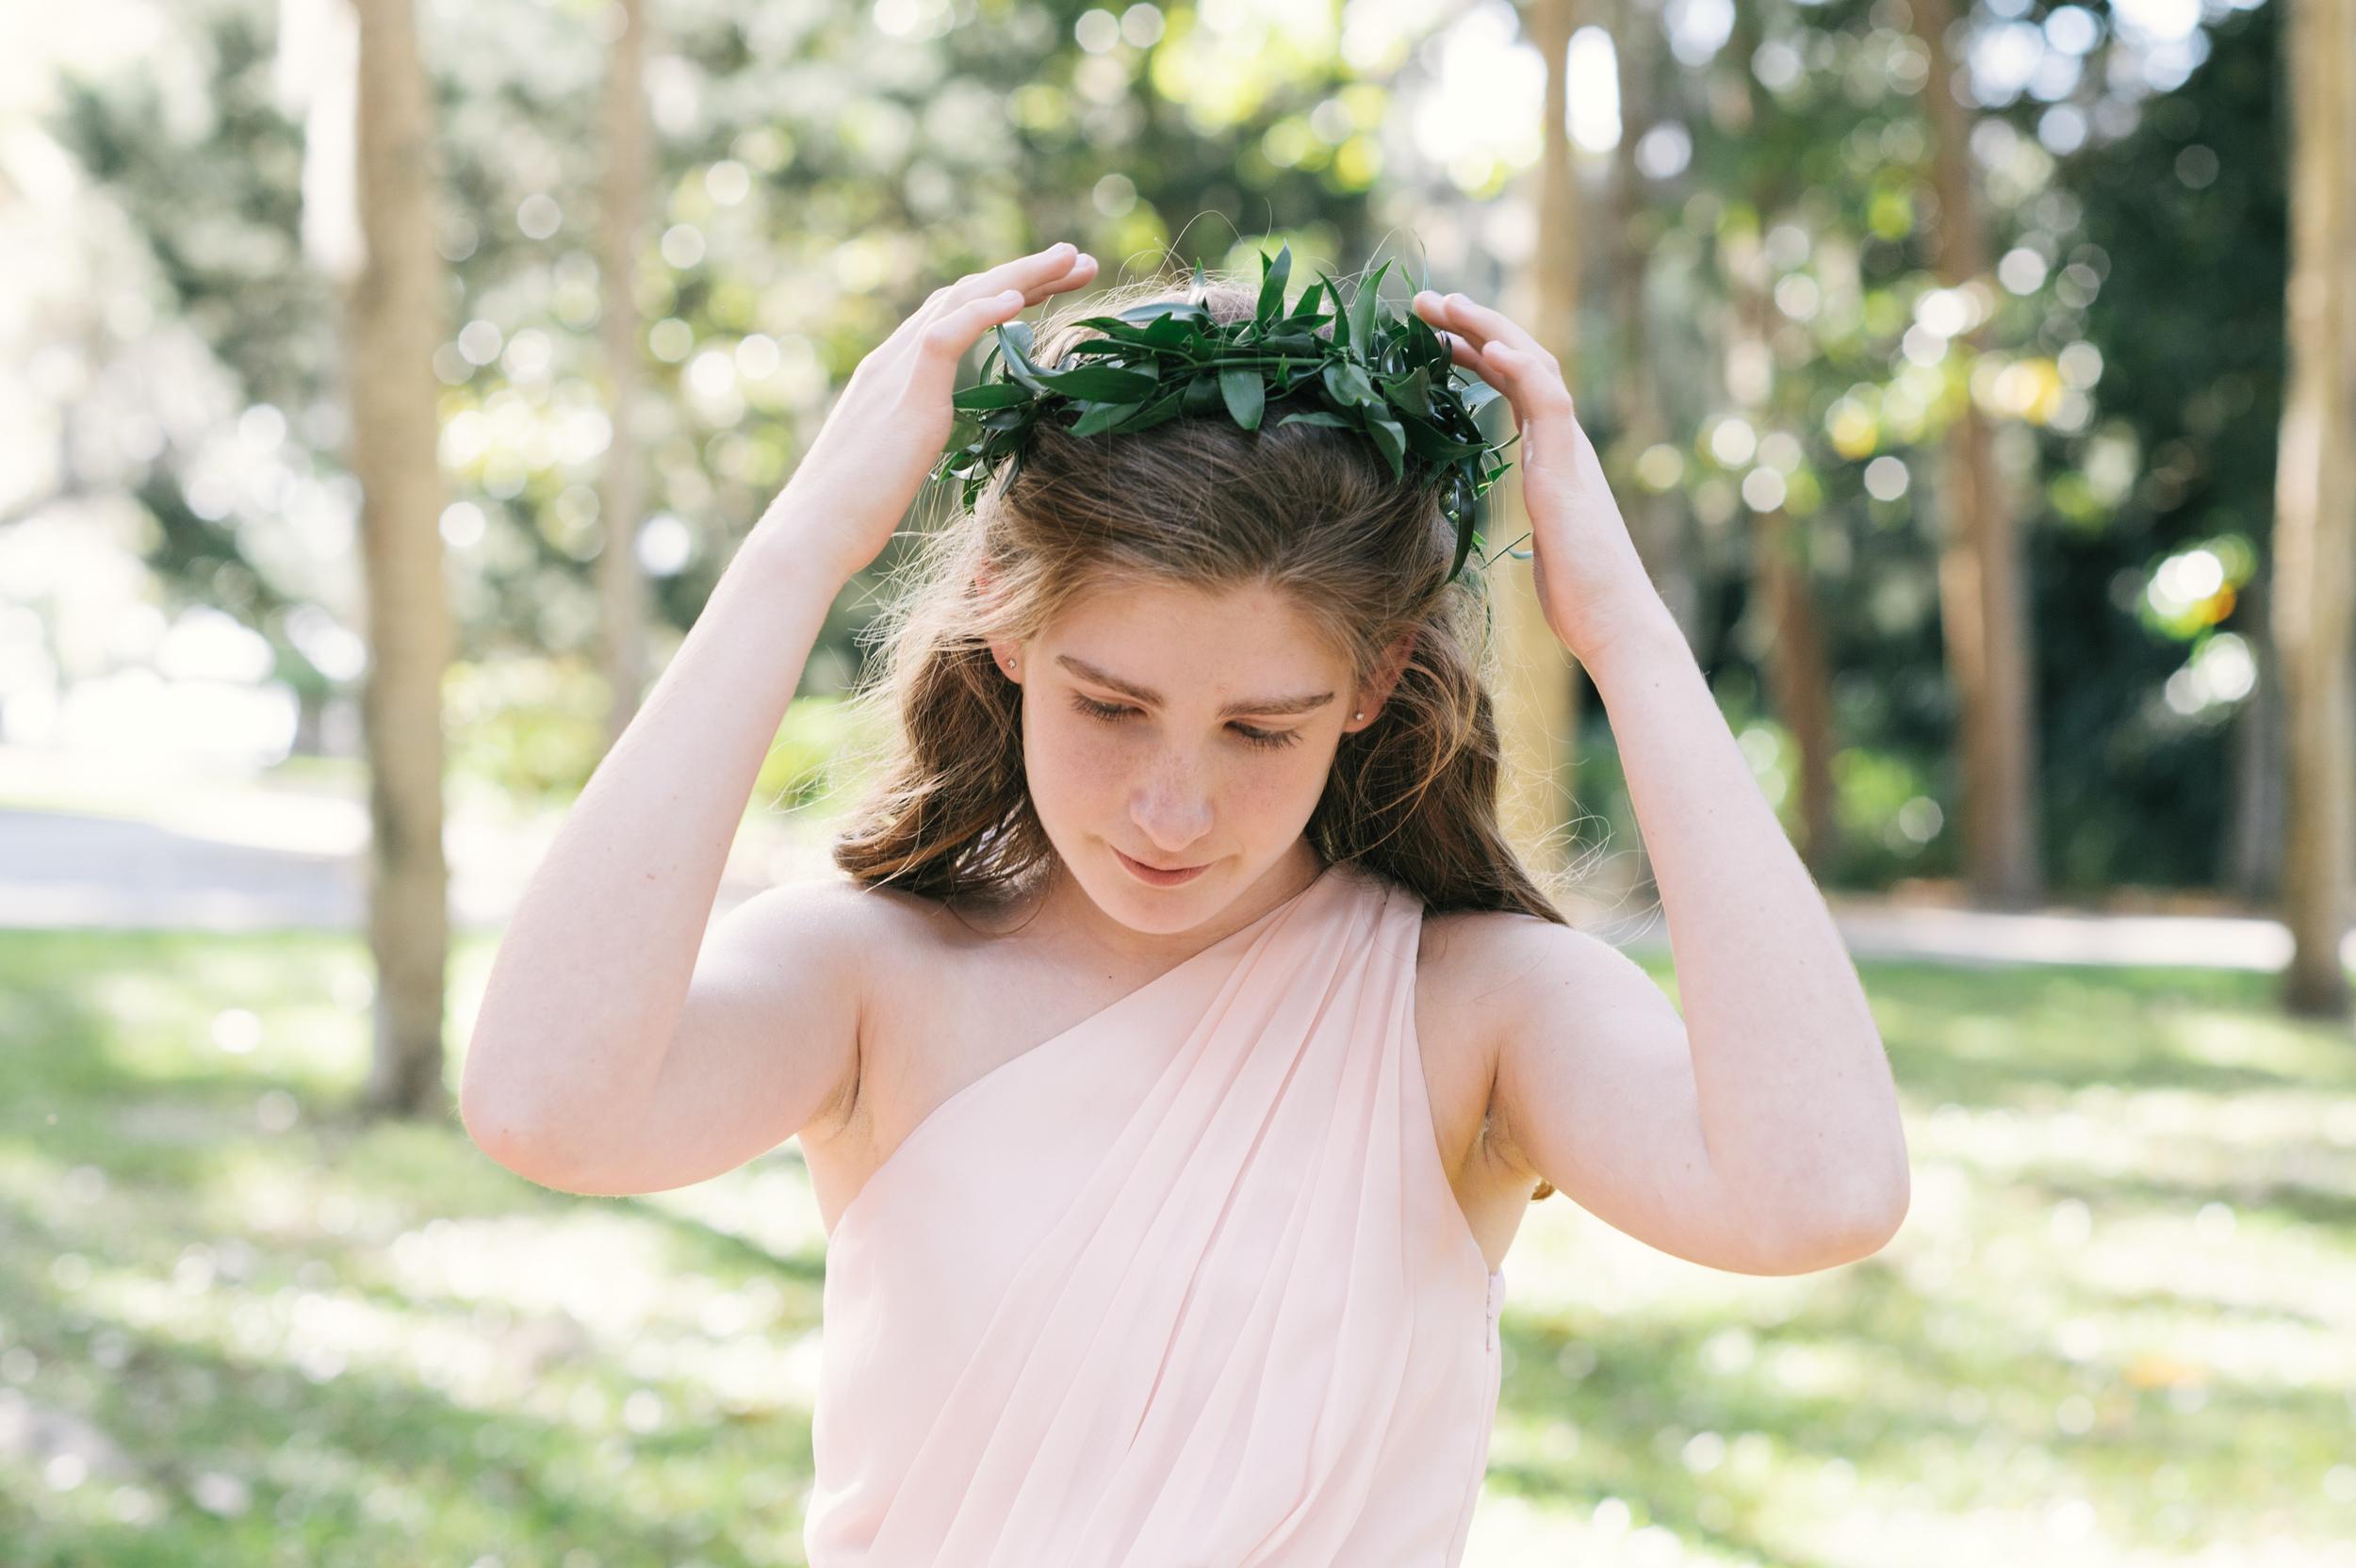 kadi-and-matt-carroll-april-9-2016-jekyl-island-wedding-m-newsom-photography- (392 of 744).jpg